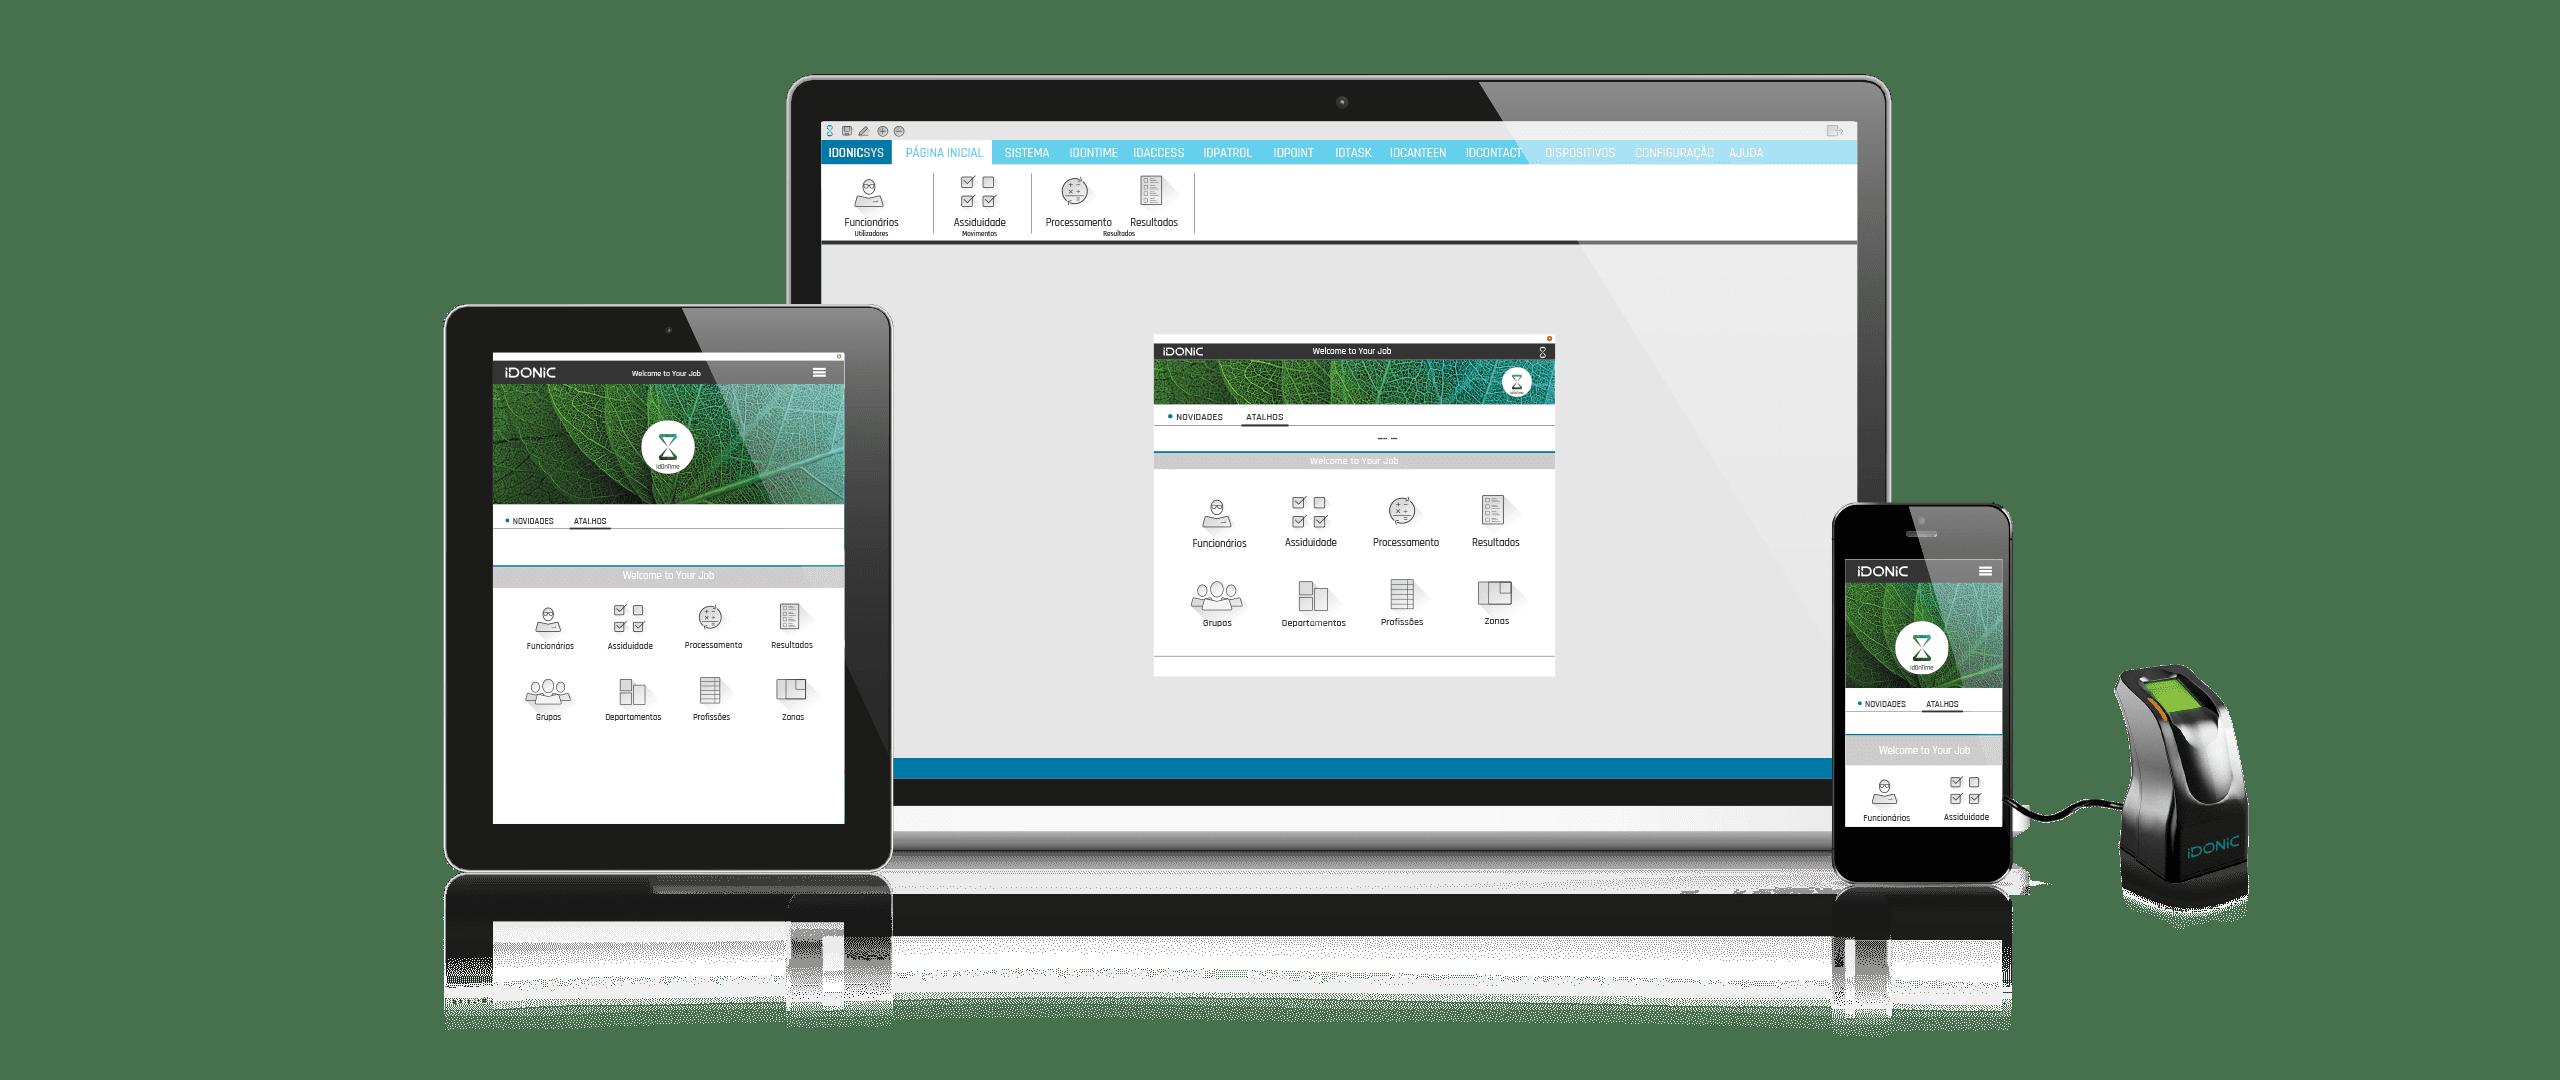 idonic-softwareWeb, Proteção de Dados, RGPD , Softwares IDONIC cumprem o RGPD, Regulamento Geral de Proteção de Dados, software IDONIC , Comissão Nacional de Proteção de Dados, Dados Biométricos